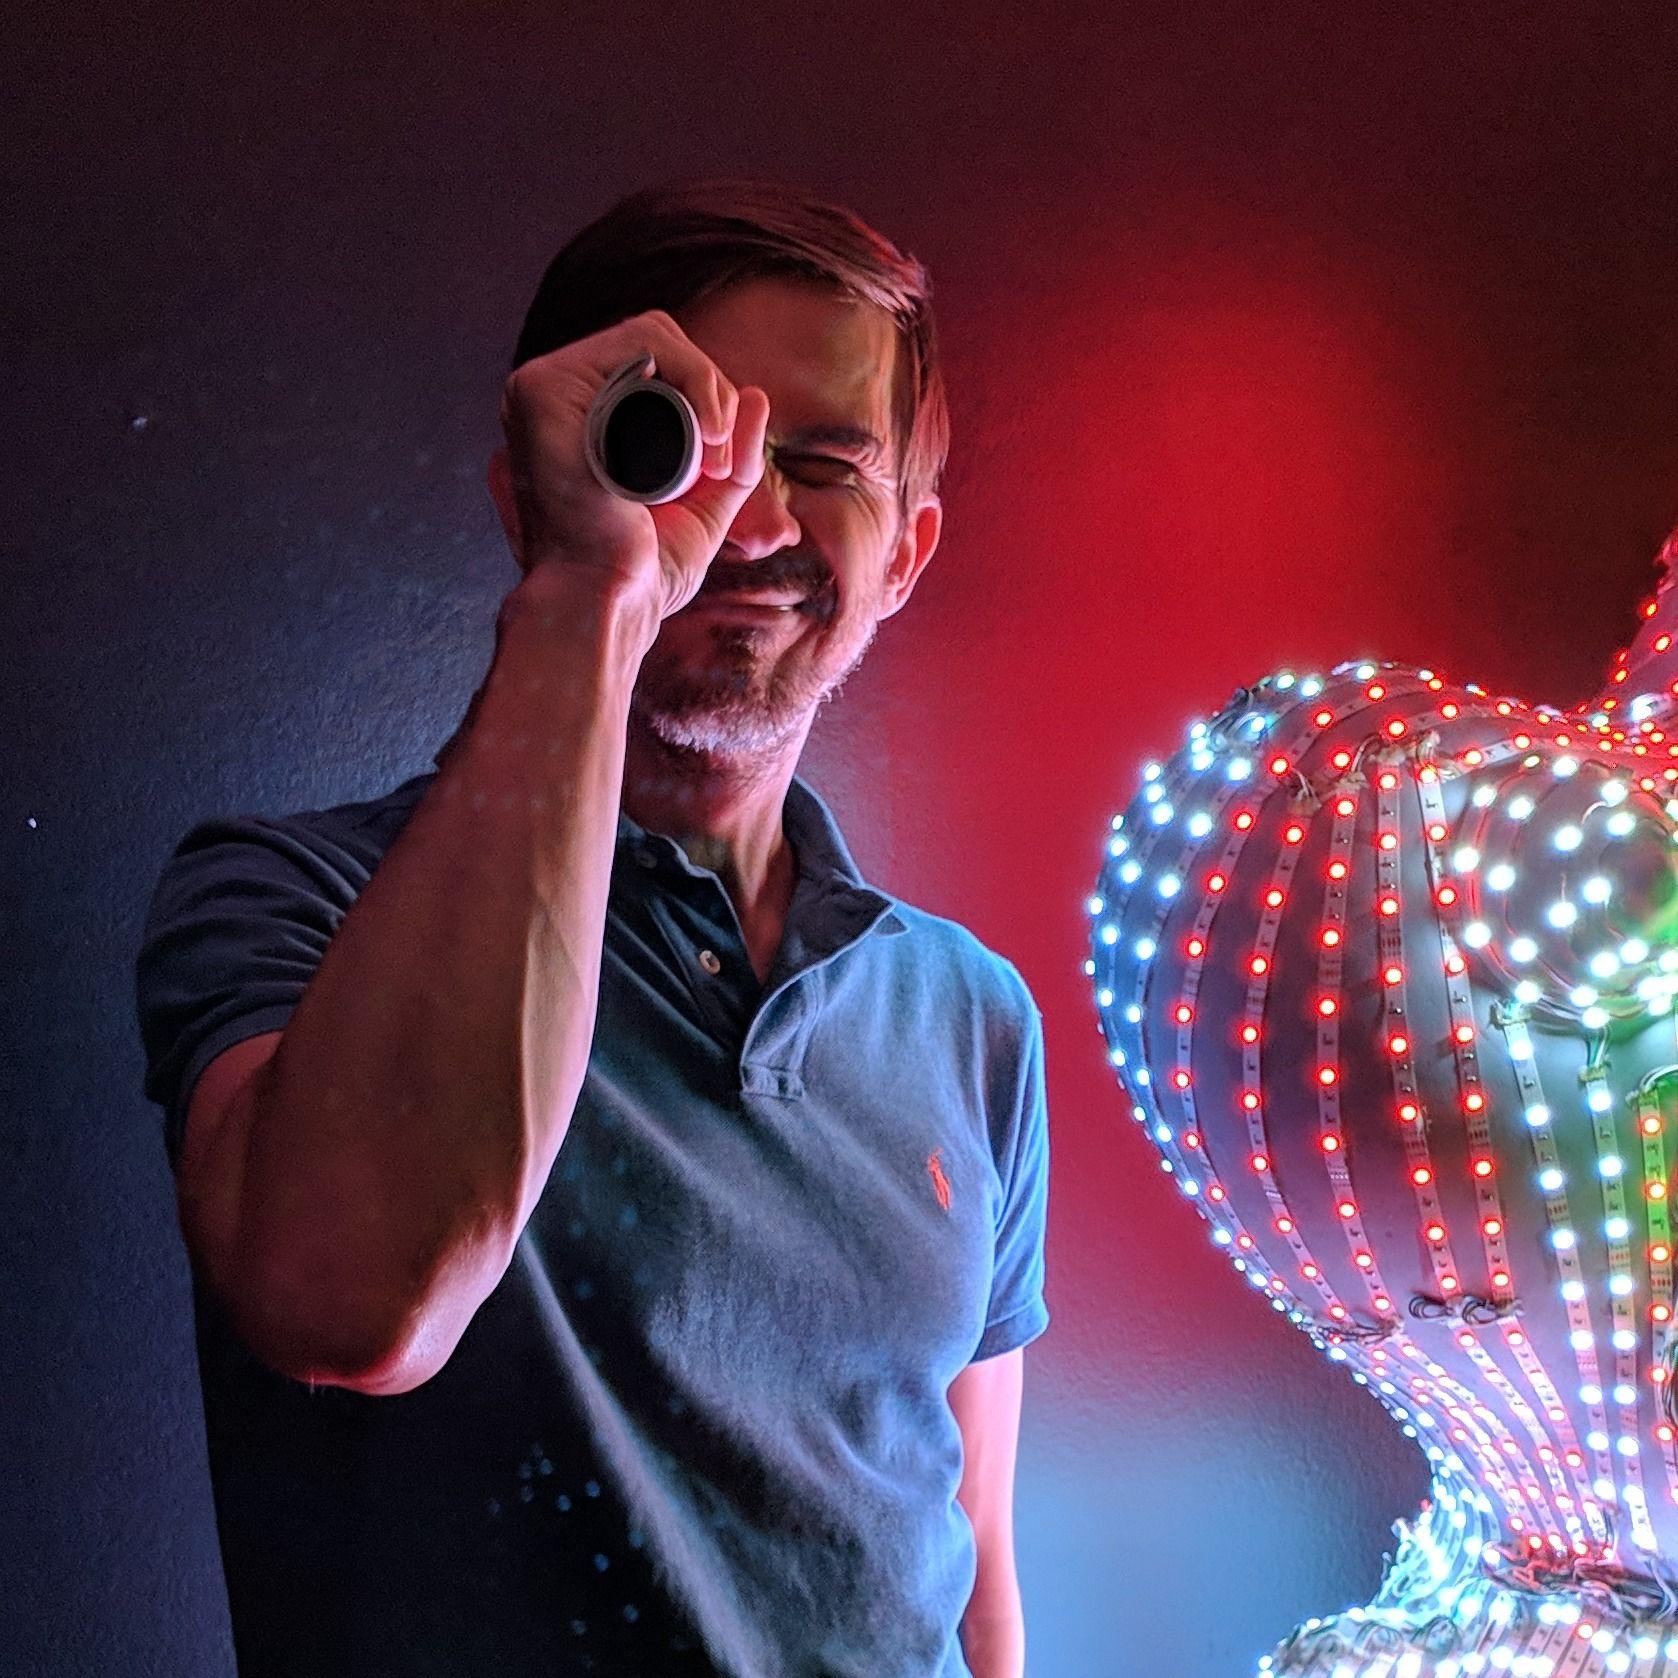 David Mossakowski Hacker Noon profile picture